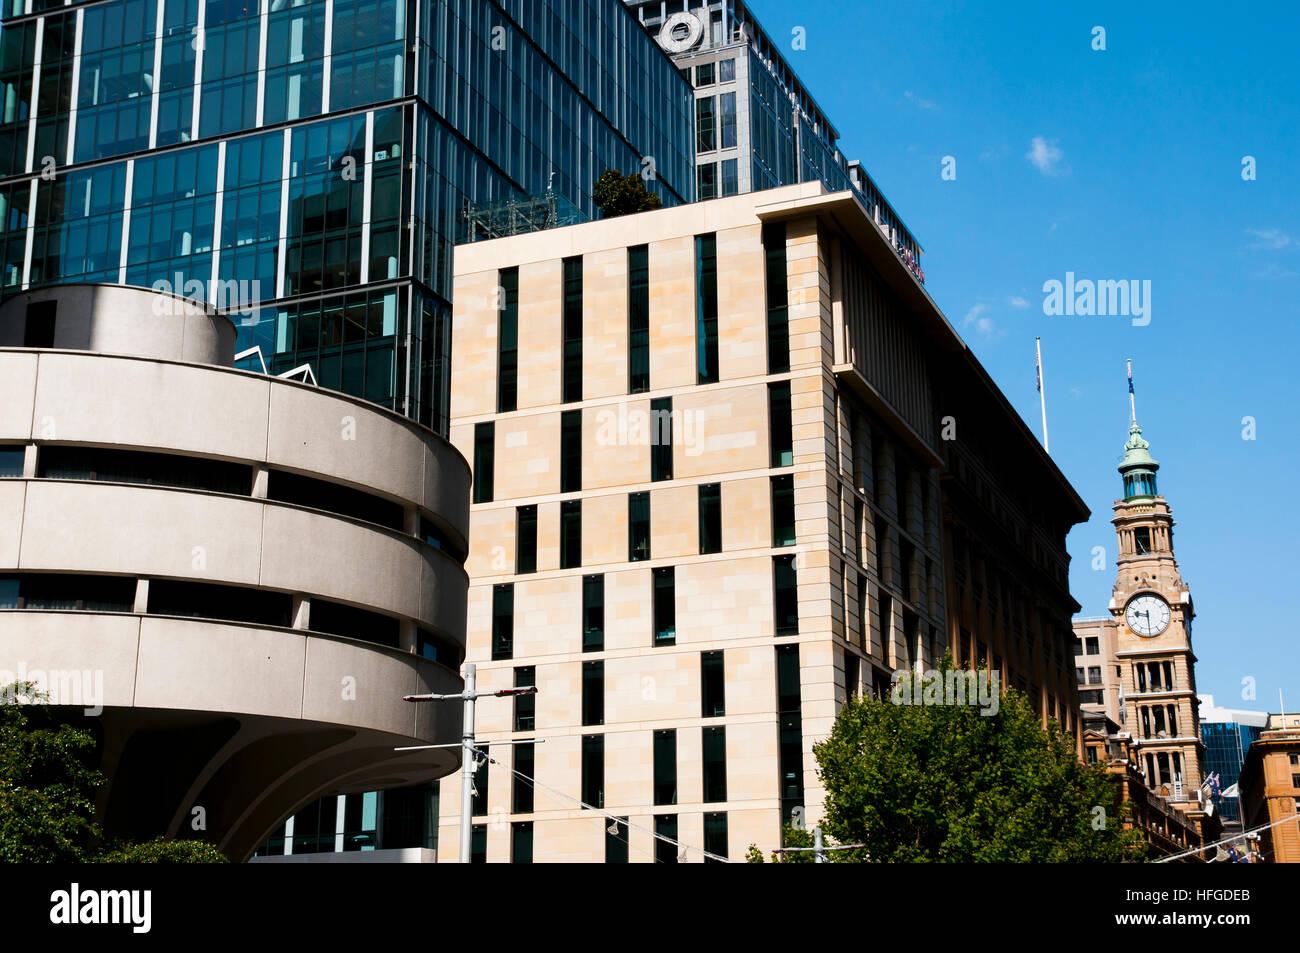 City Buildings on Martin Pl - Sydney - Australia - Stock Image